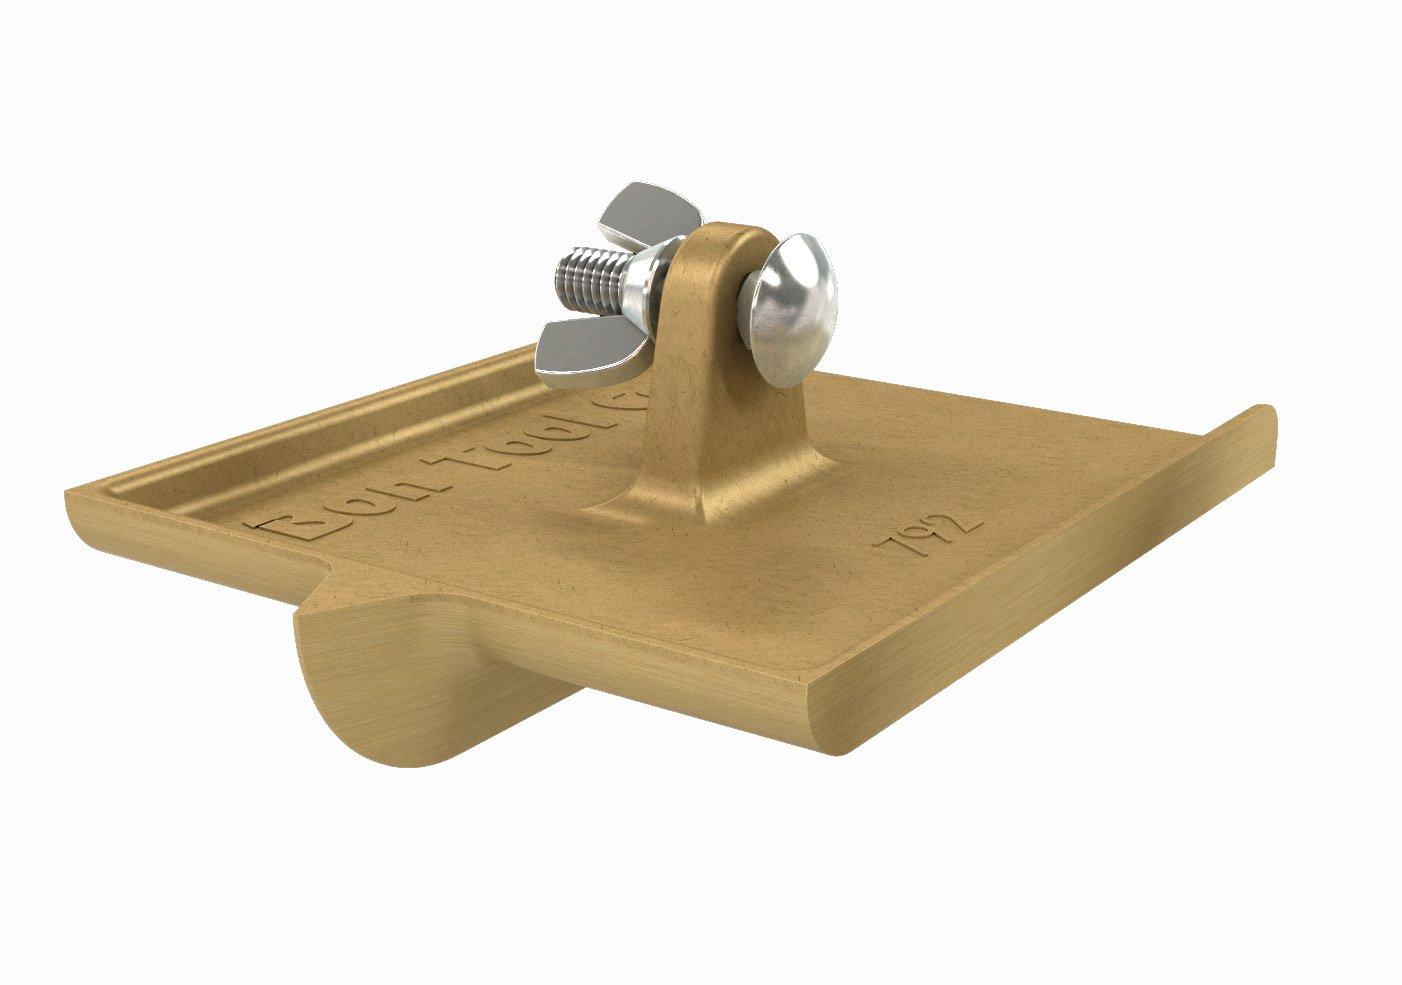 Bon 12-792 6-Inch by 4-1/2-Inch Bronze Walking Concrete Groover, 5/8-Inch Bit Depth, 5/8-Inch Bit Width